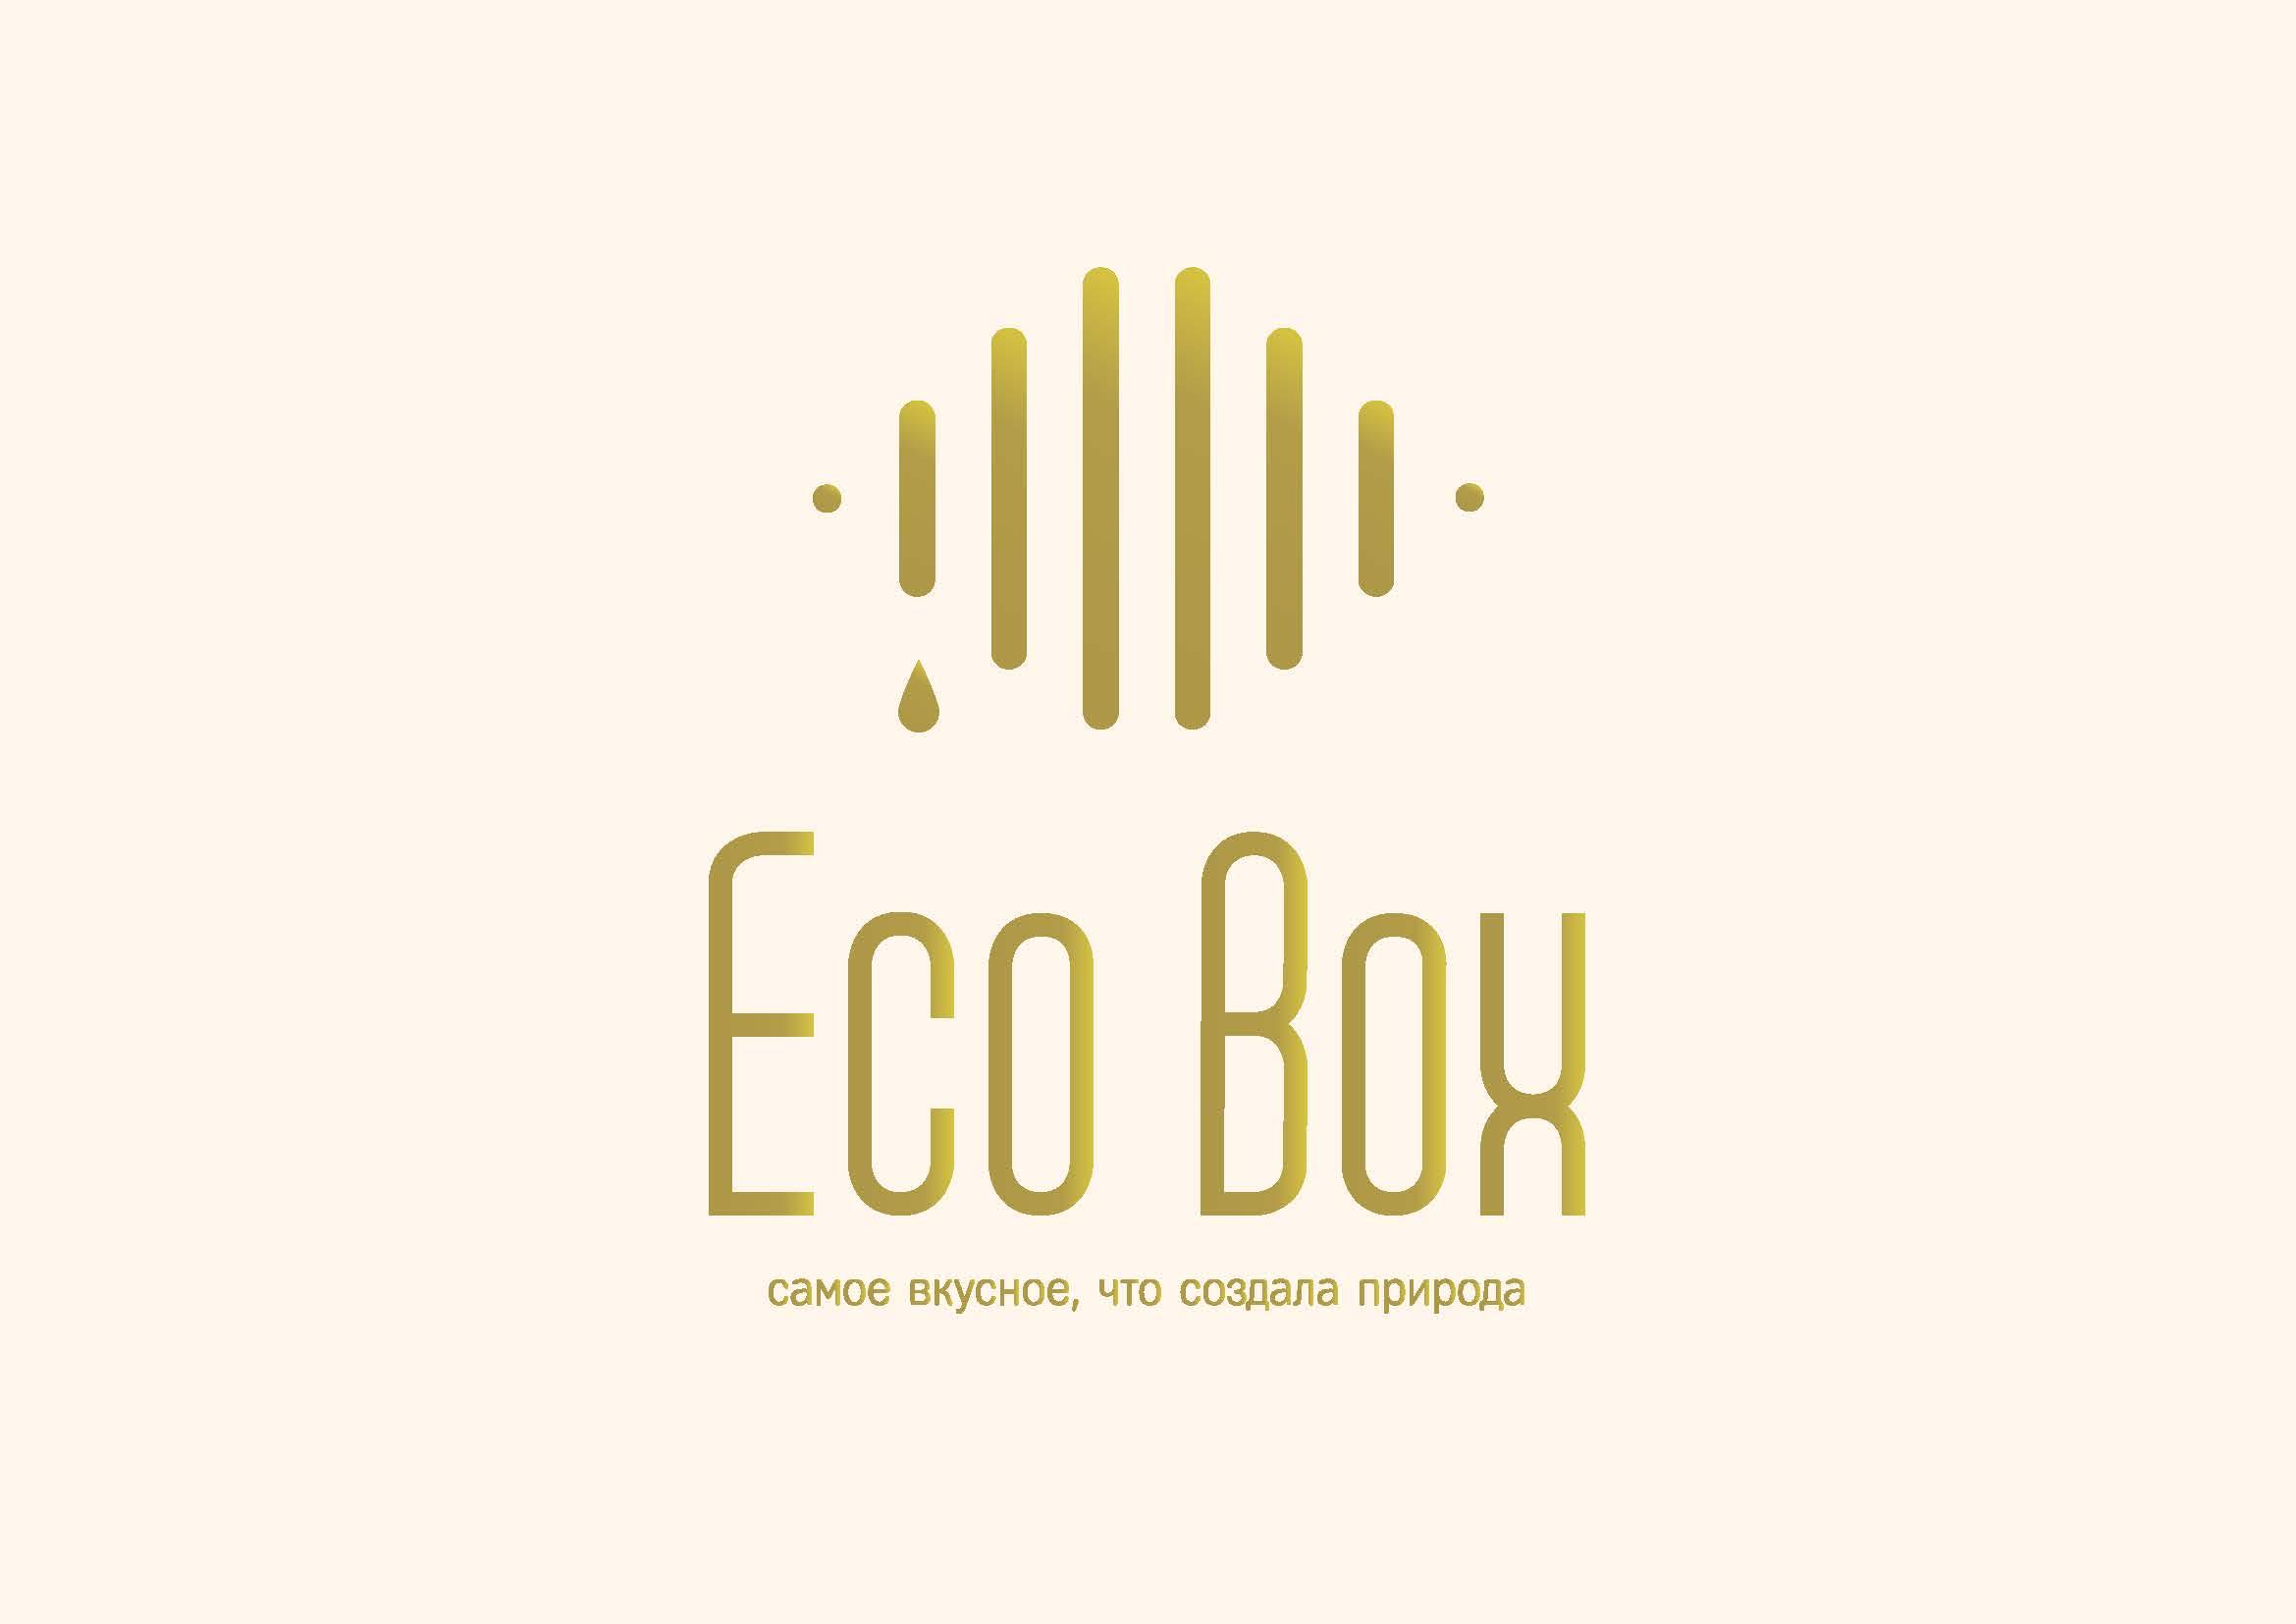 eco-box logo.jpg